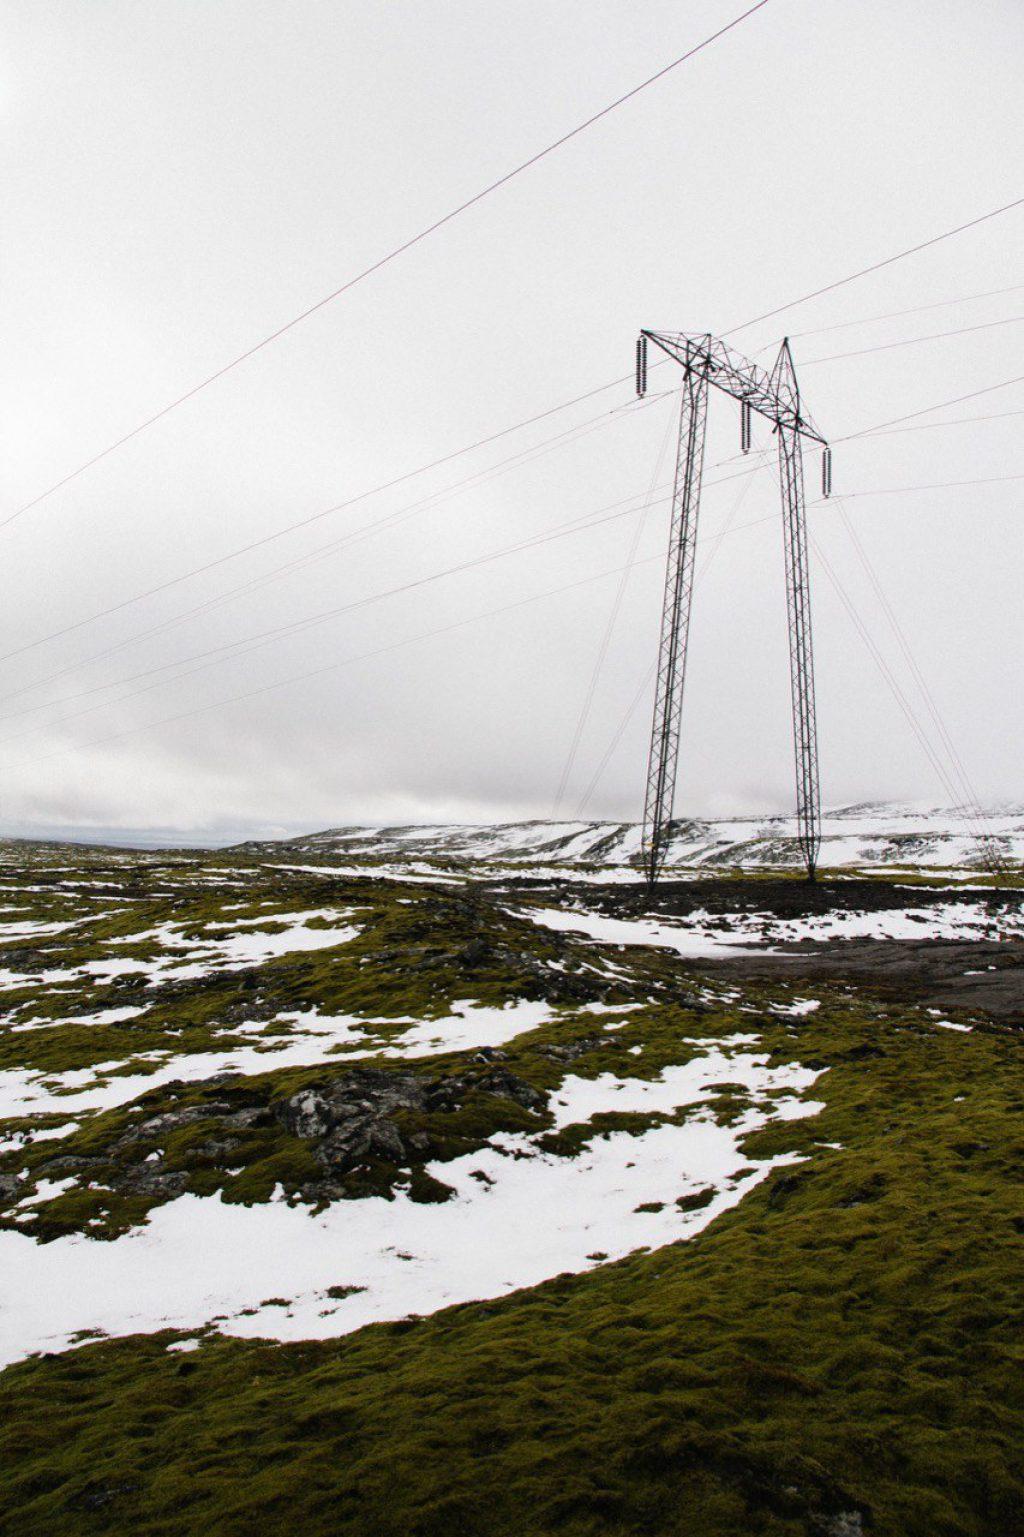 Iceland 2017 05 01 00 16 08